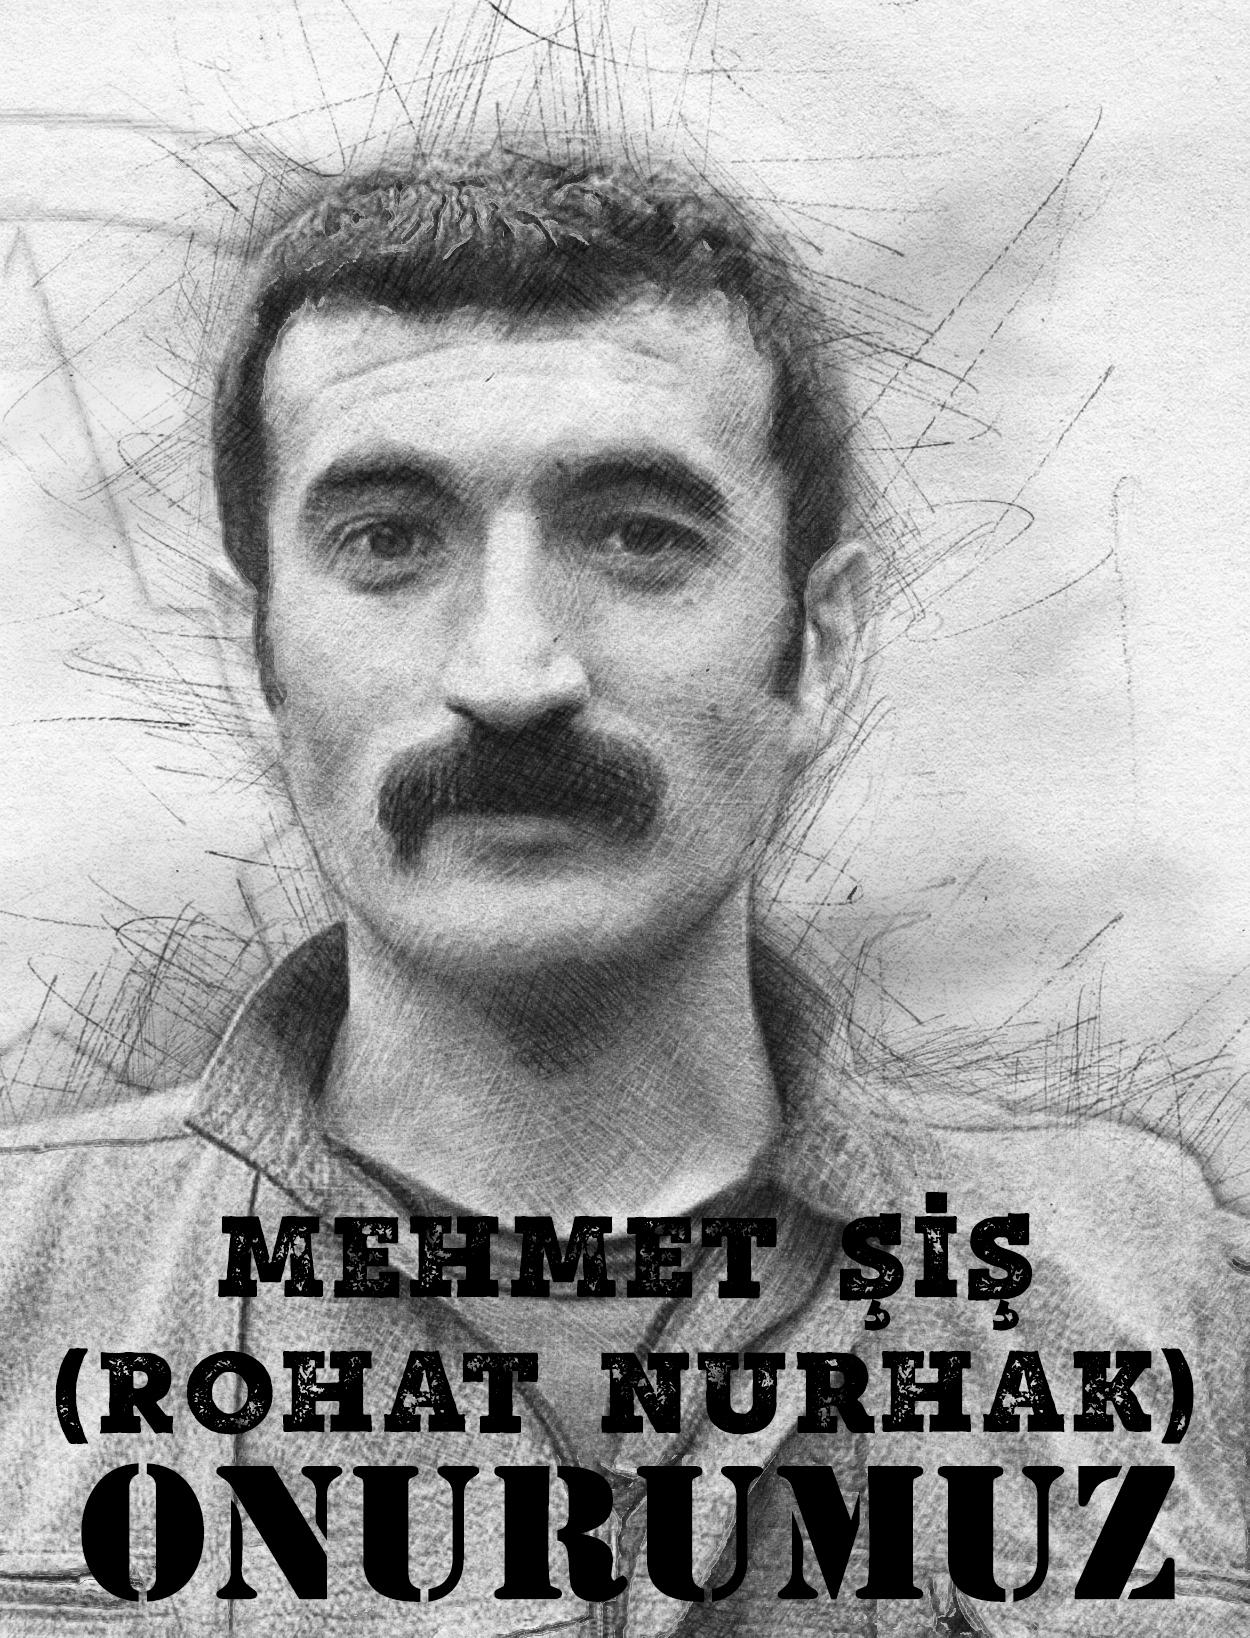 Mehmet Şiş